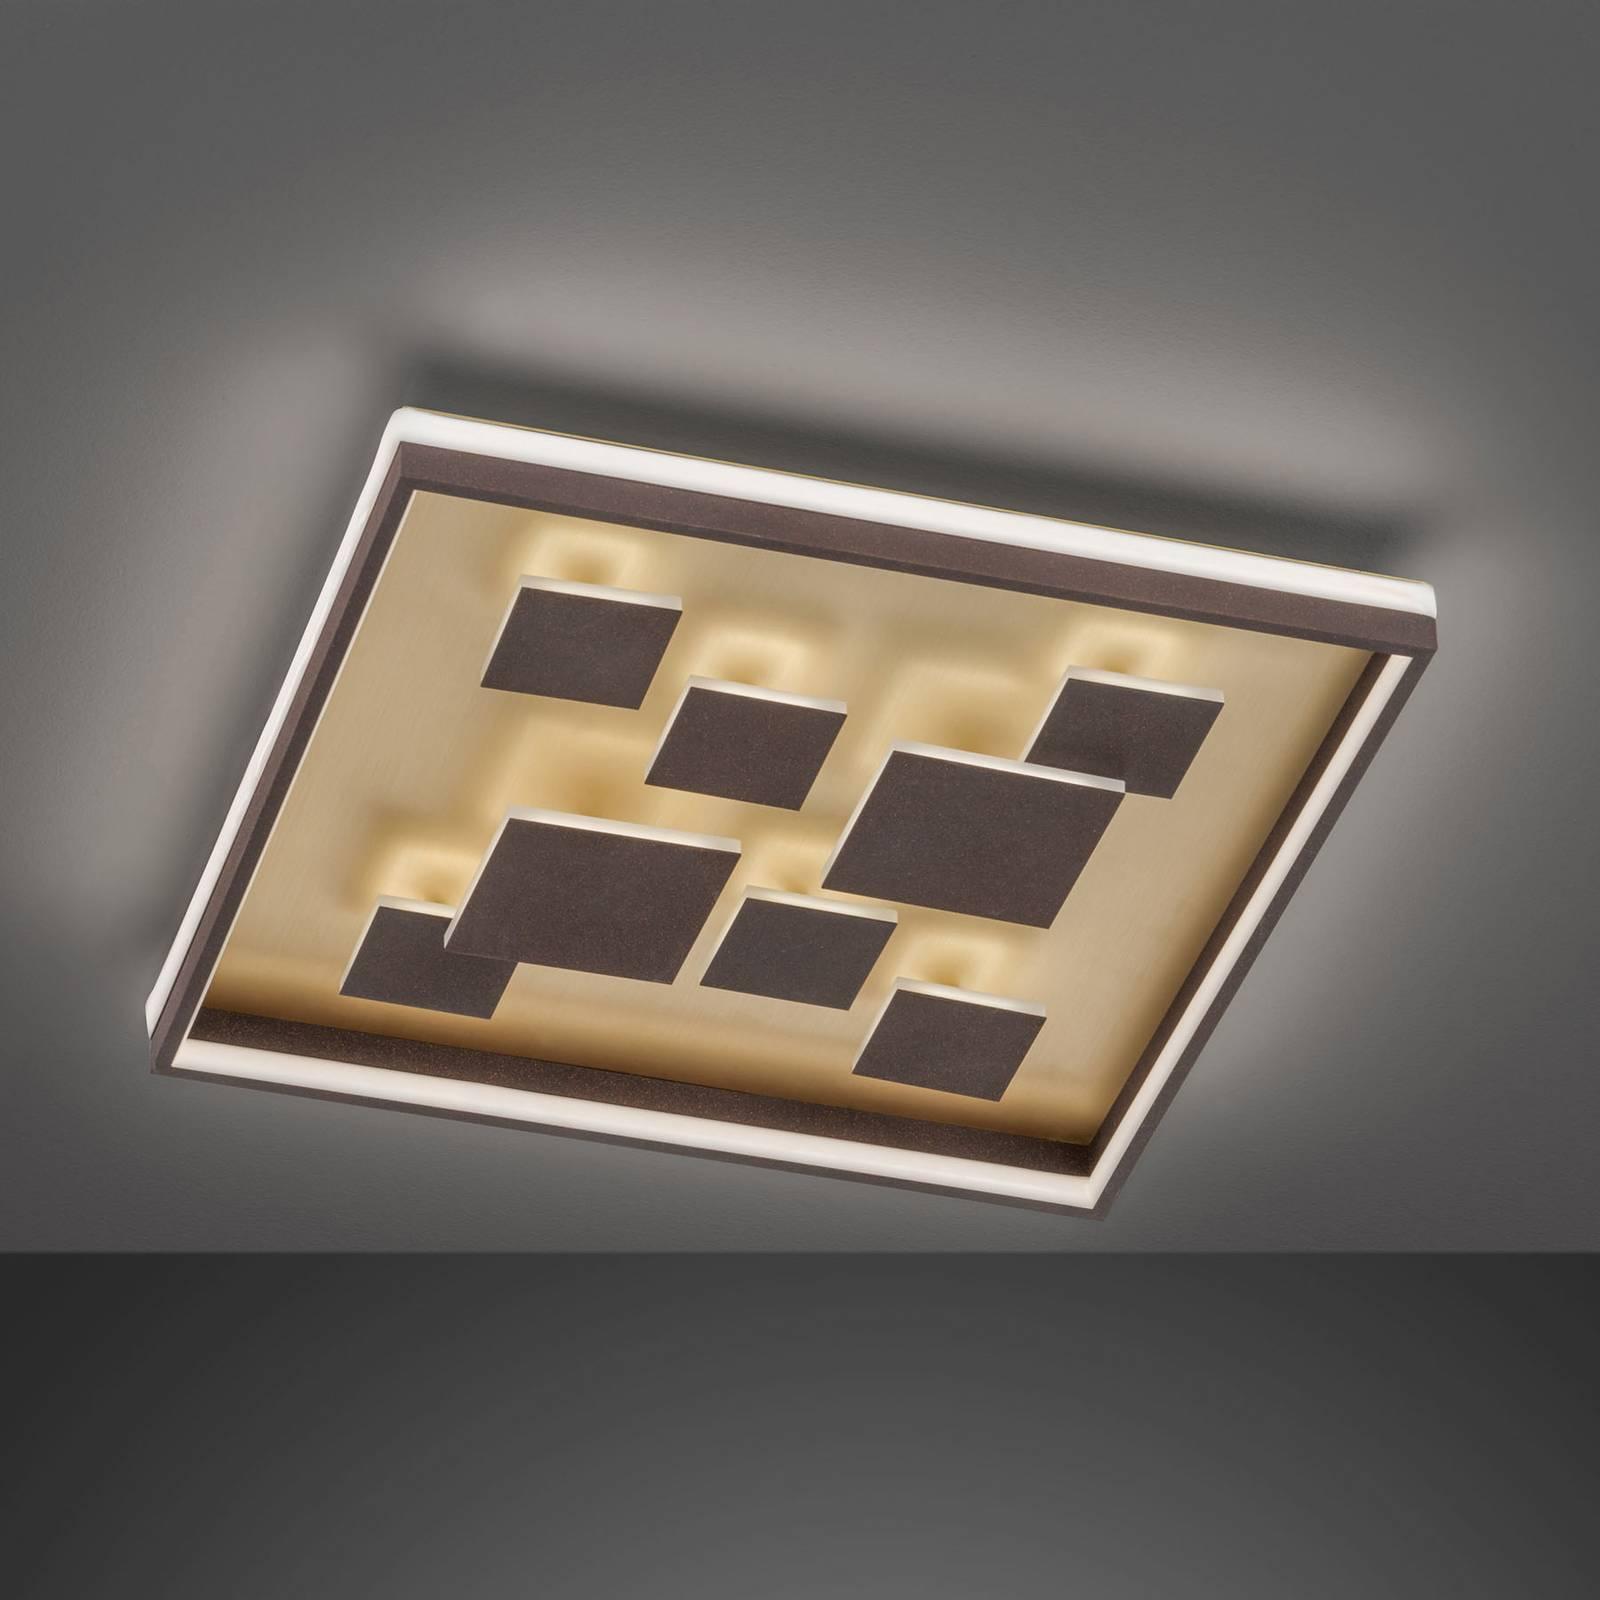 LED plafondlamp Rico, dimbaar, hoekig, bruin